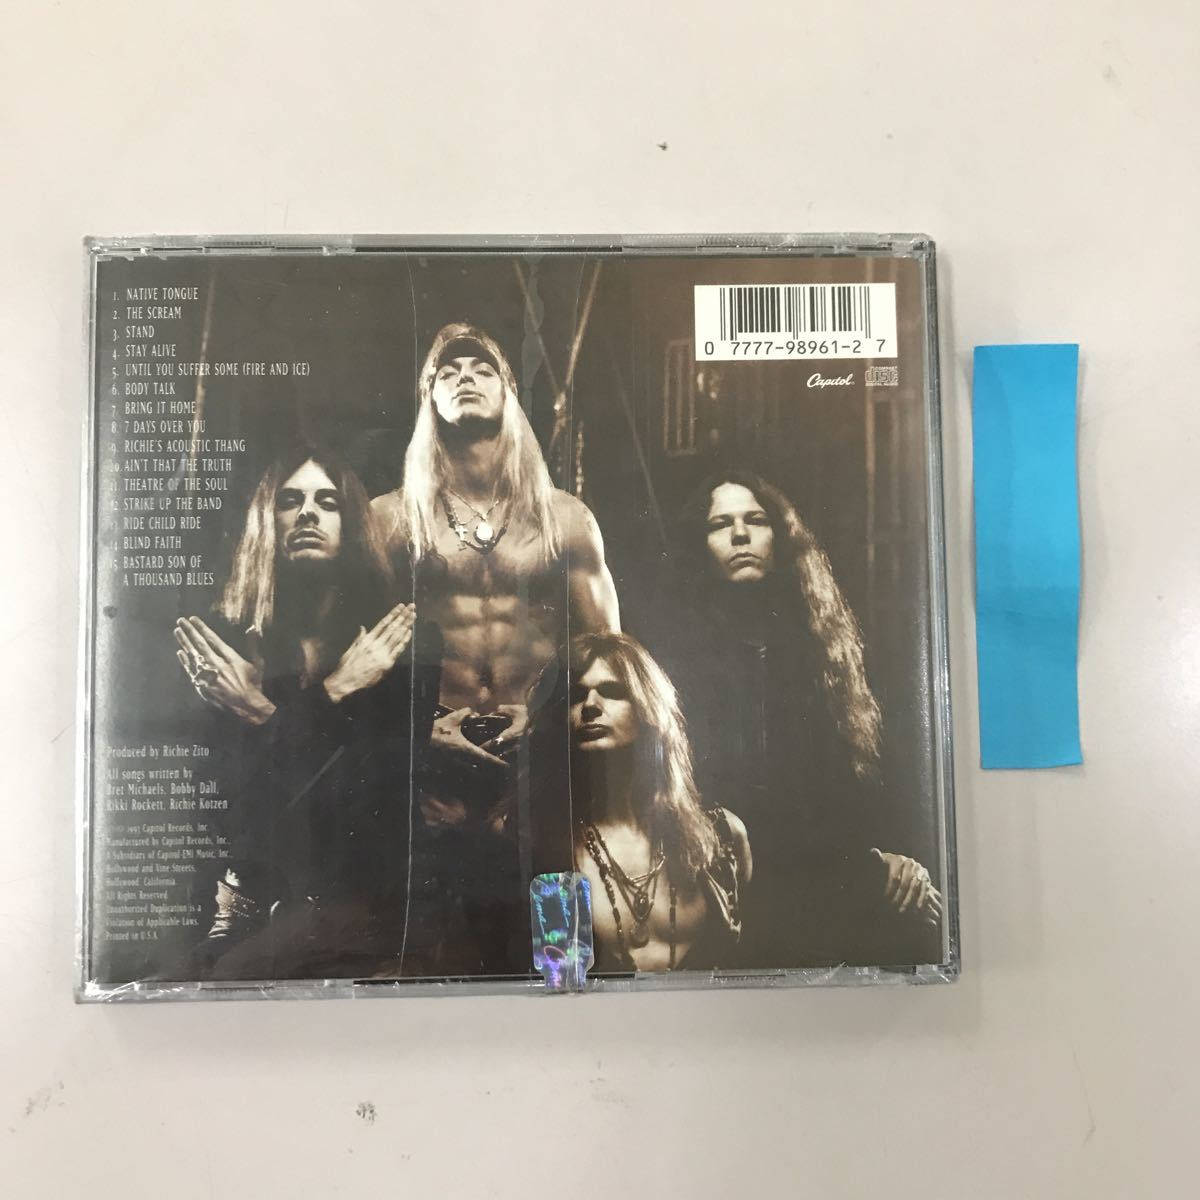 CD 輸入盤未開封【洋楽】長期保存品 POISON NATINE TONGUE